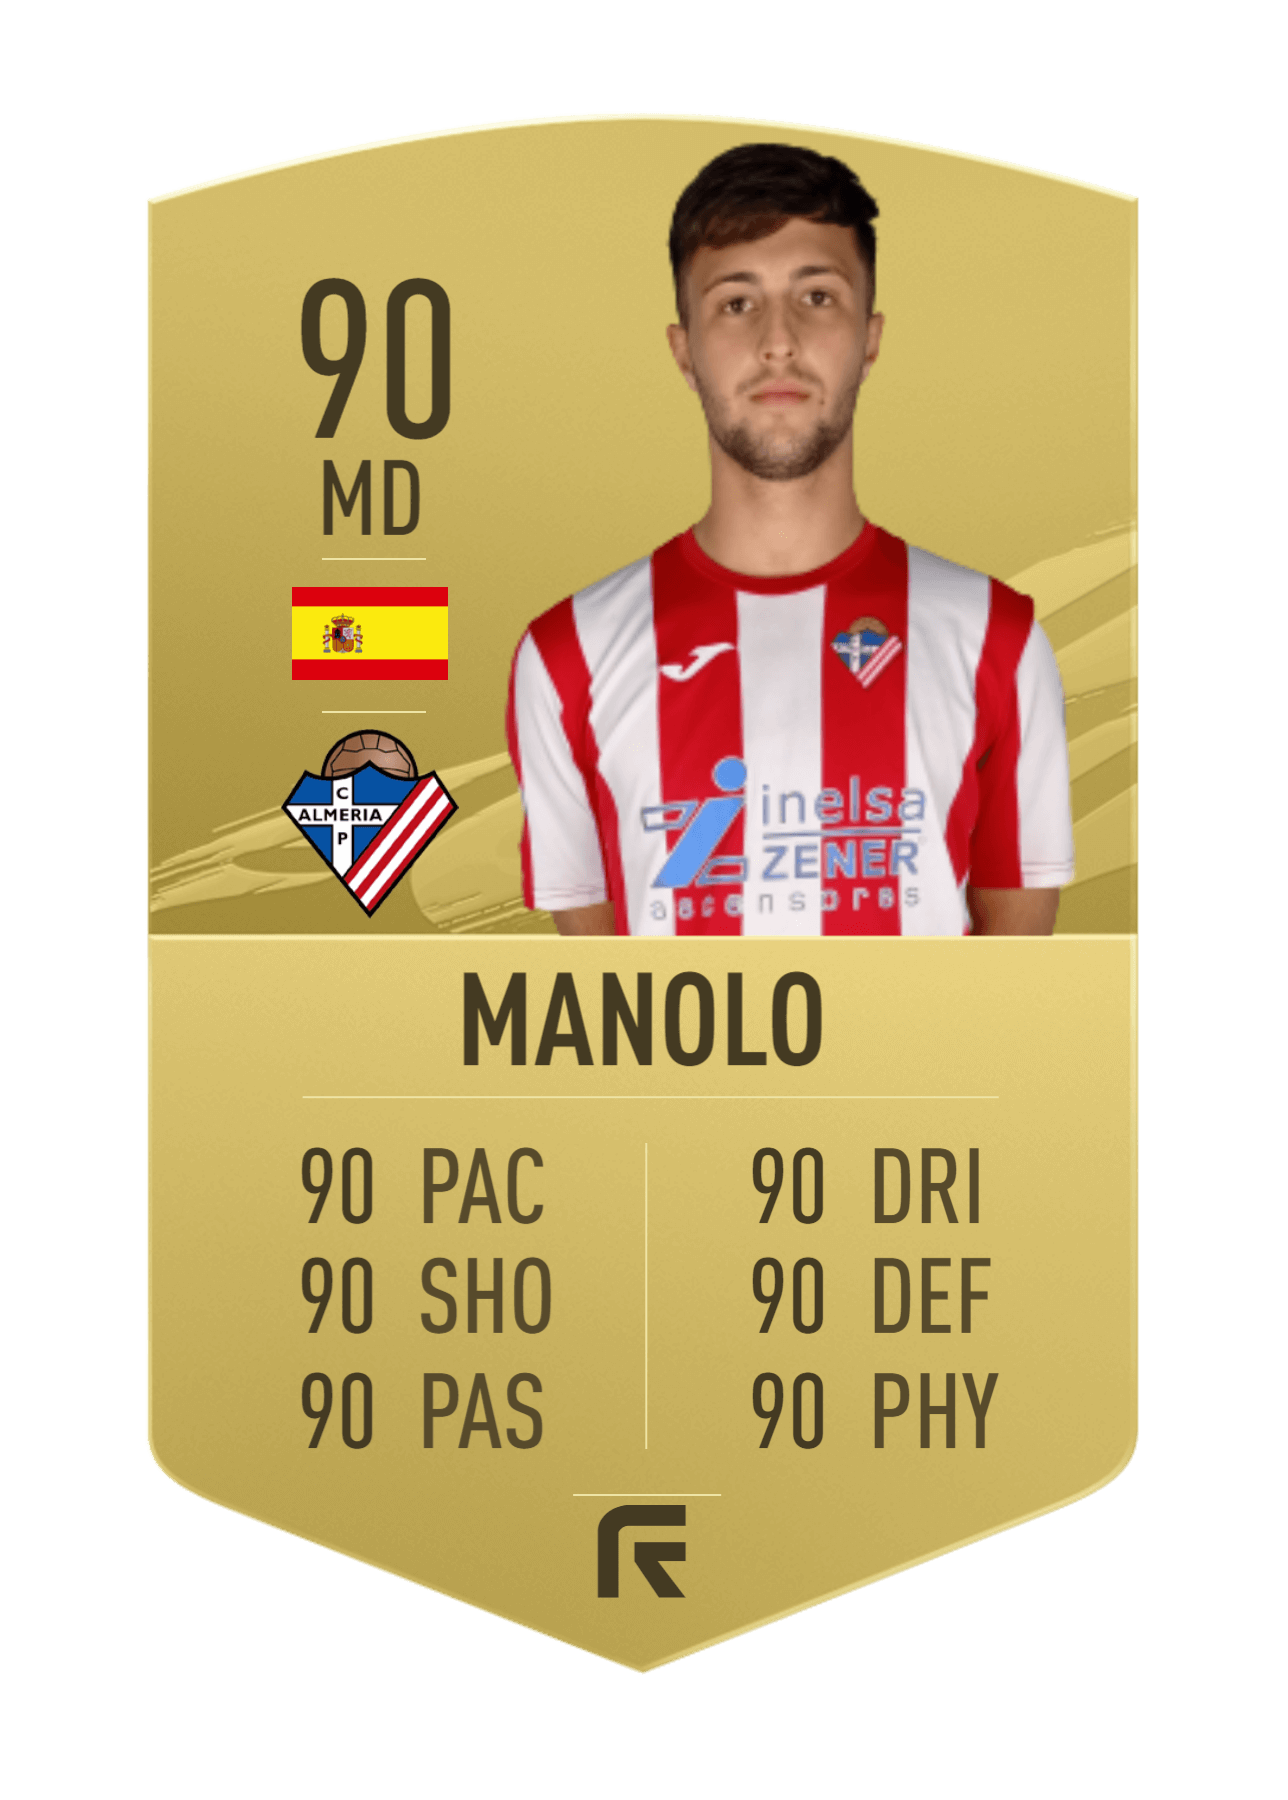 Manolo_cromo